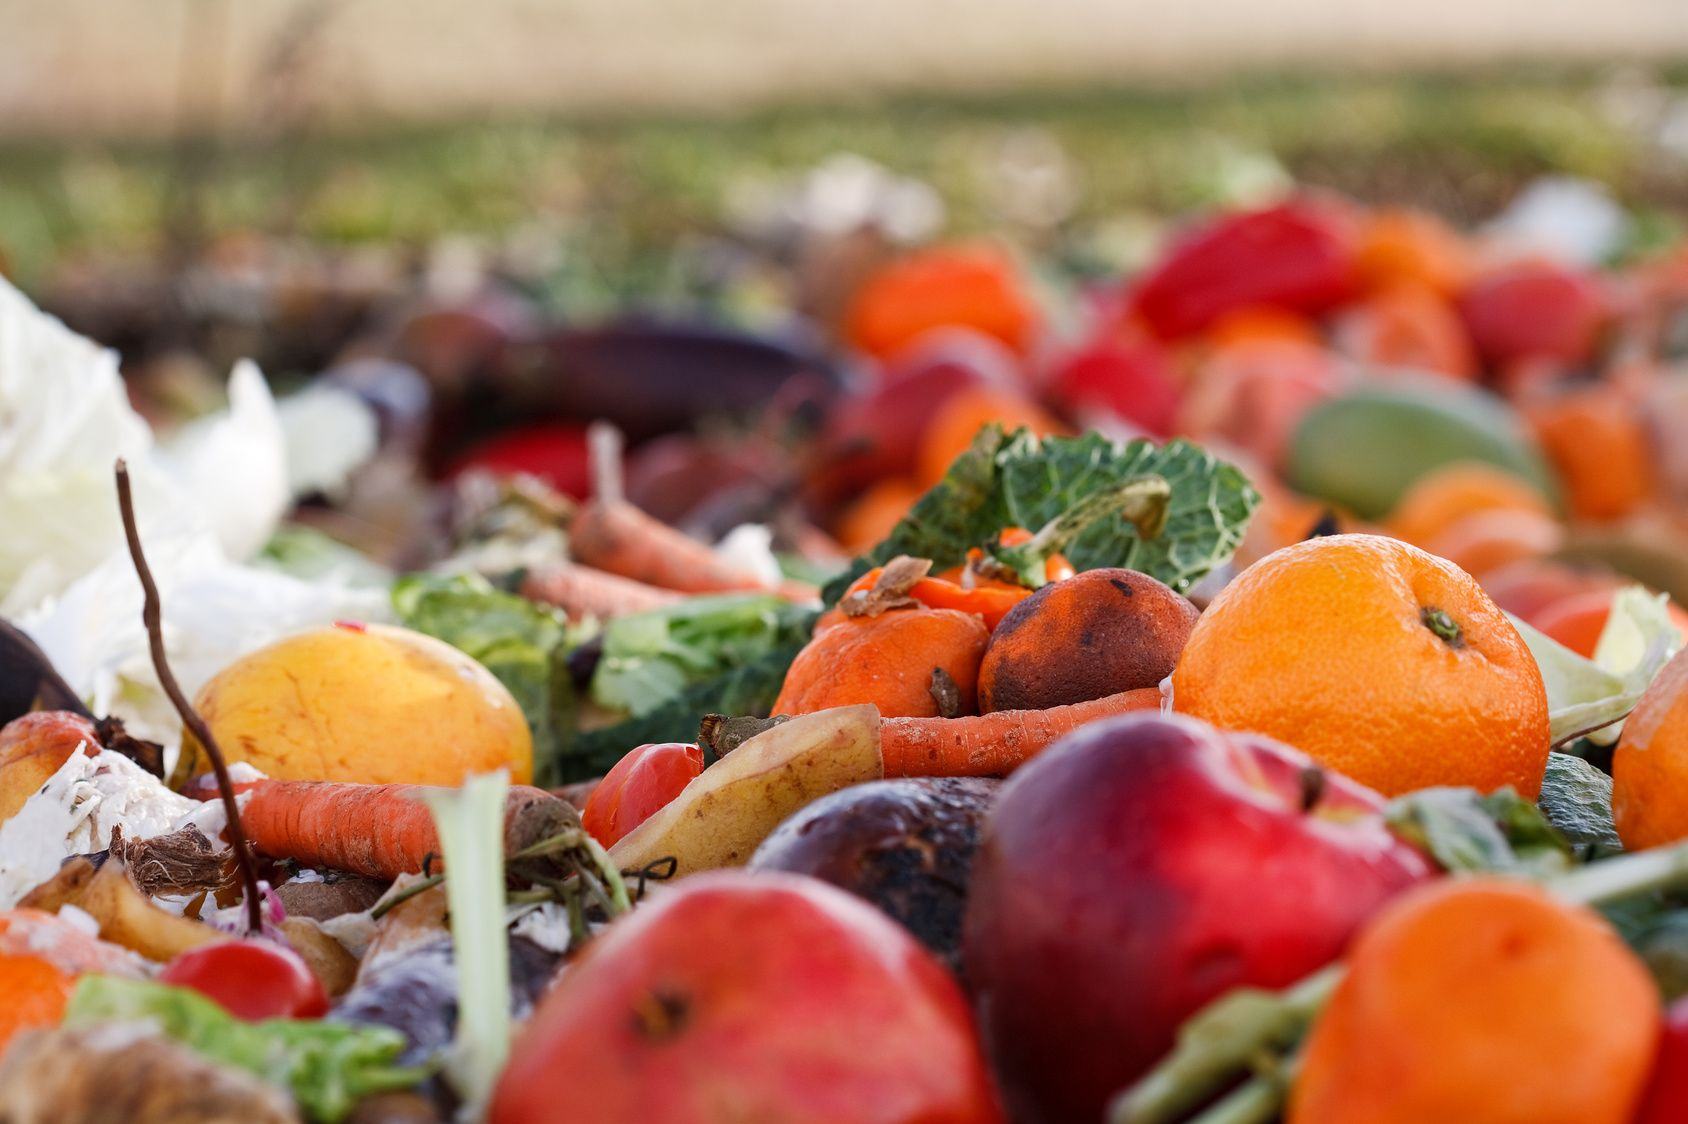 CBC Radio Interview: HEAL's Paul van der Werf on Food Waste